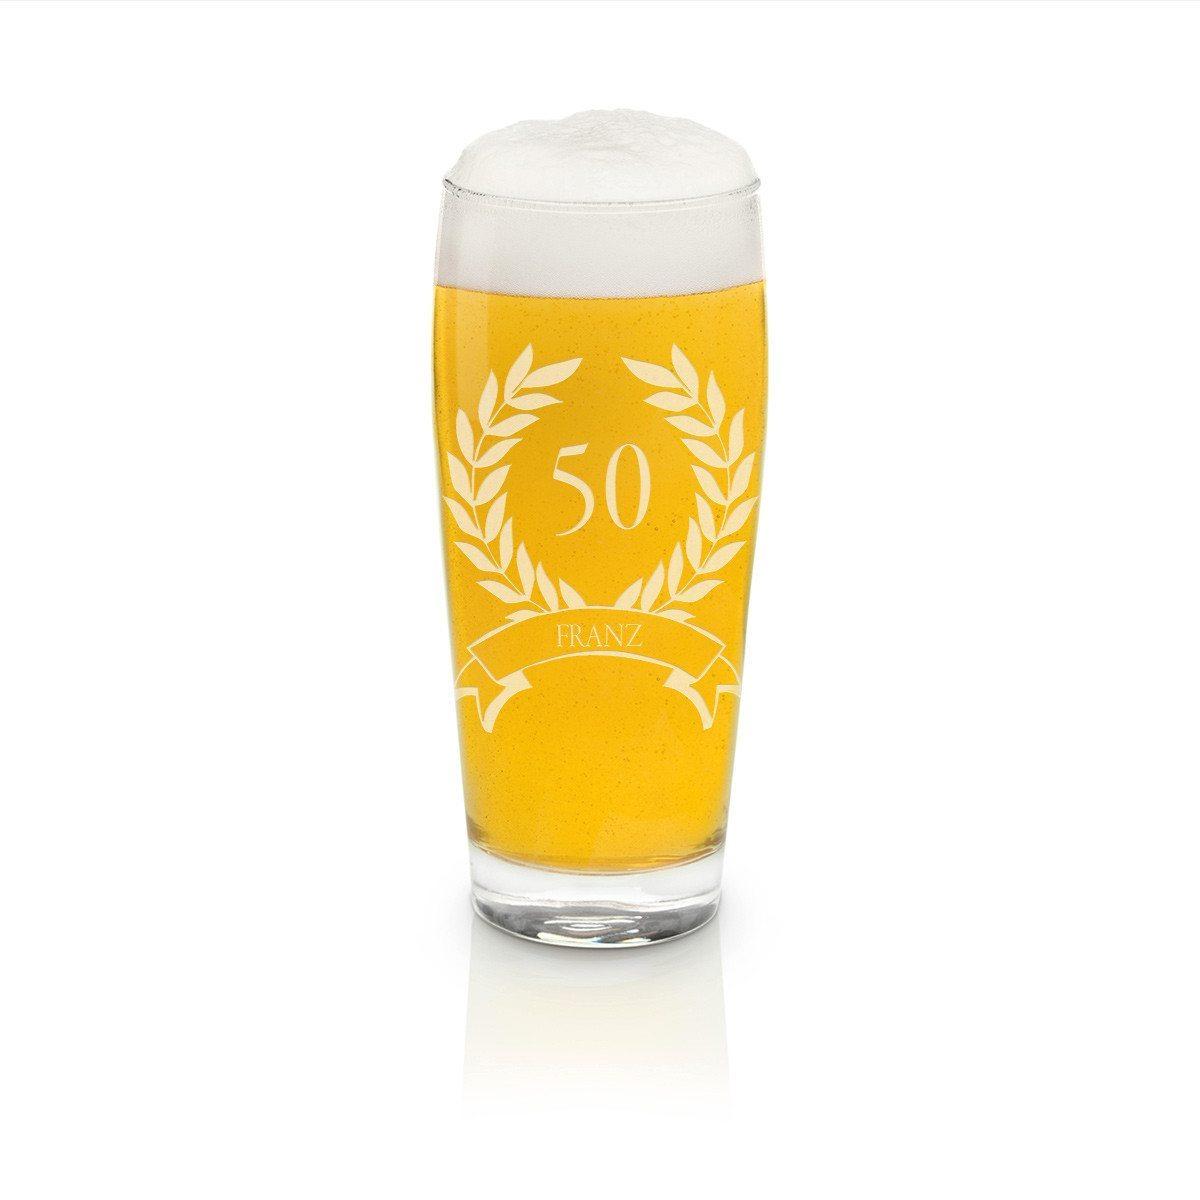 Bierglas Helles-Glas 0,5l - Jubiläum